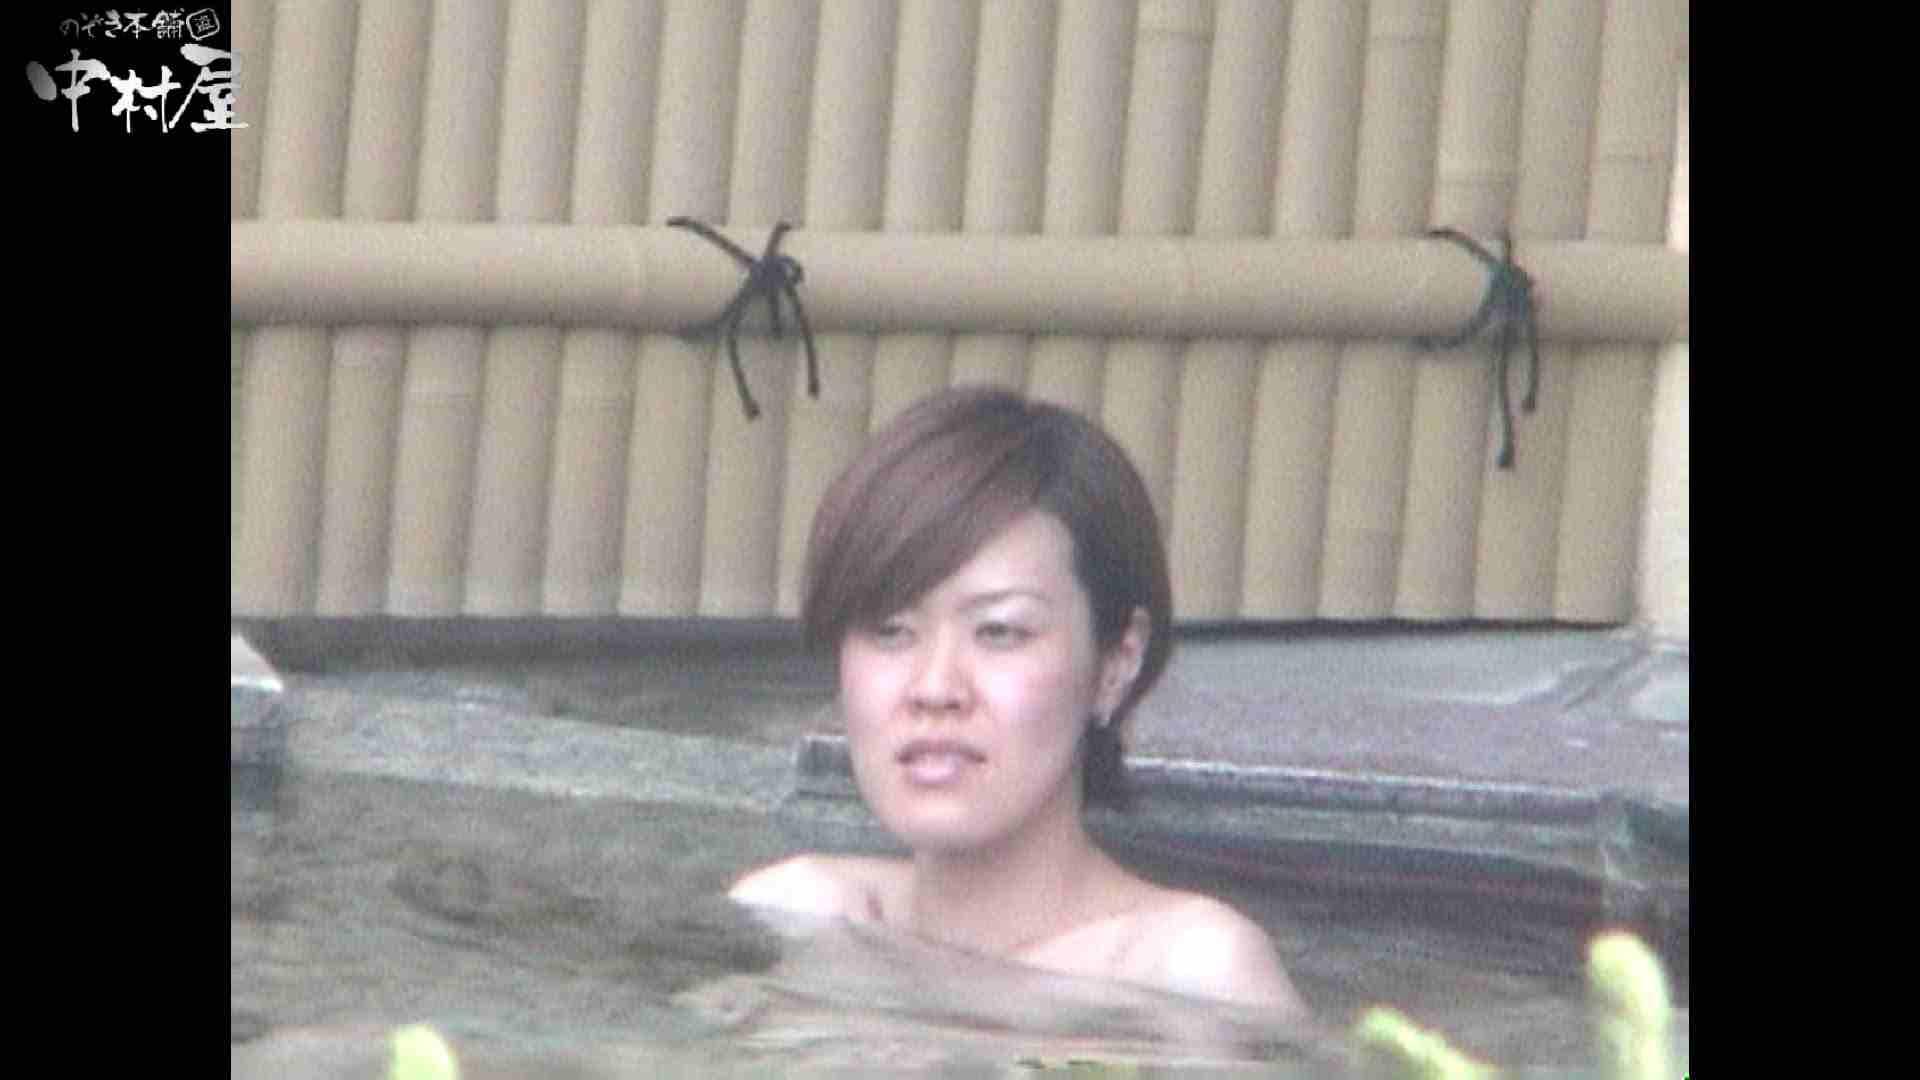 Aquaな露天風呂Vol.961 OLセックス | 盗撮  86画像 61